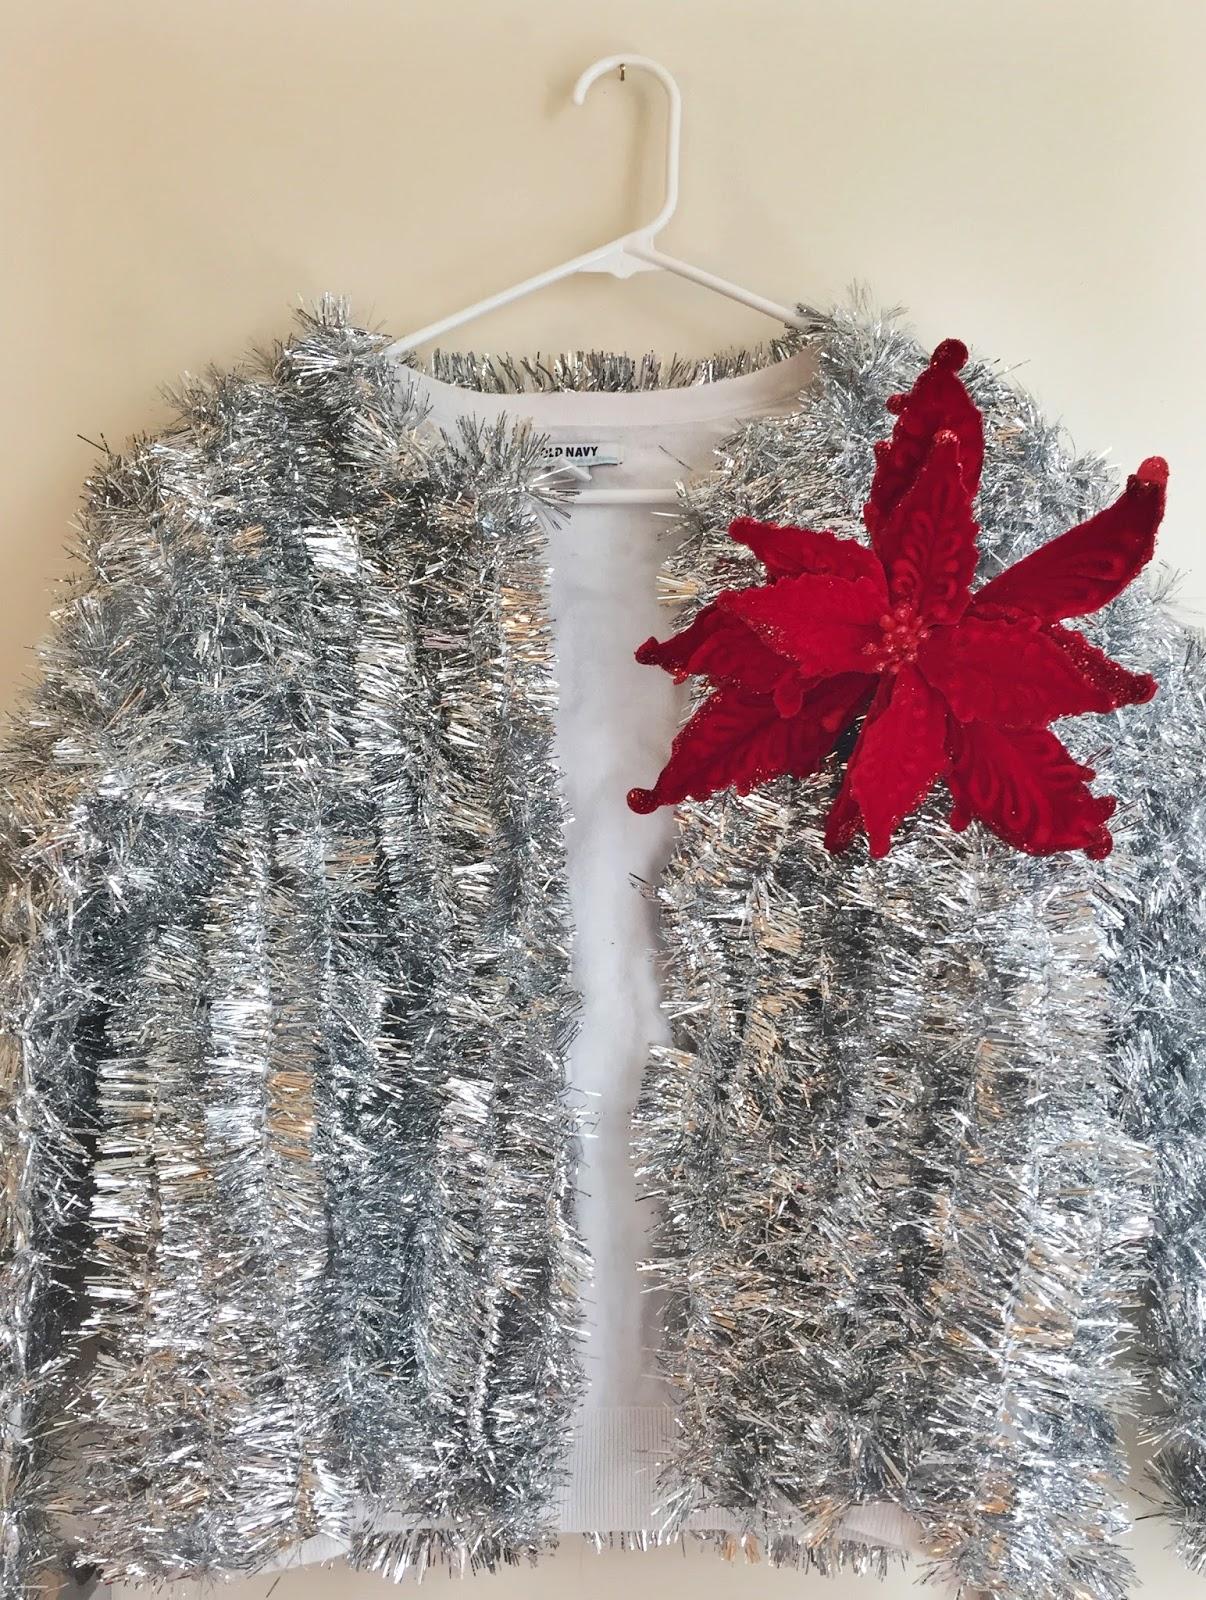 Tis The Season To Sparkle Diy Ugly Sweater A Shot Of Brandi